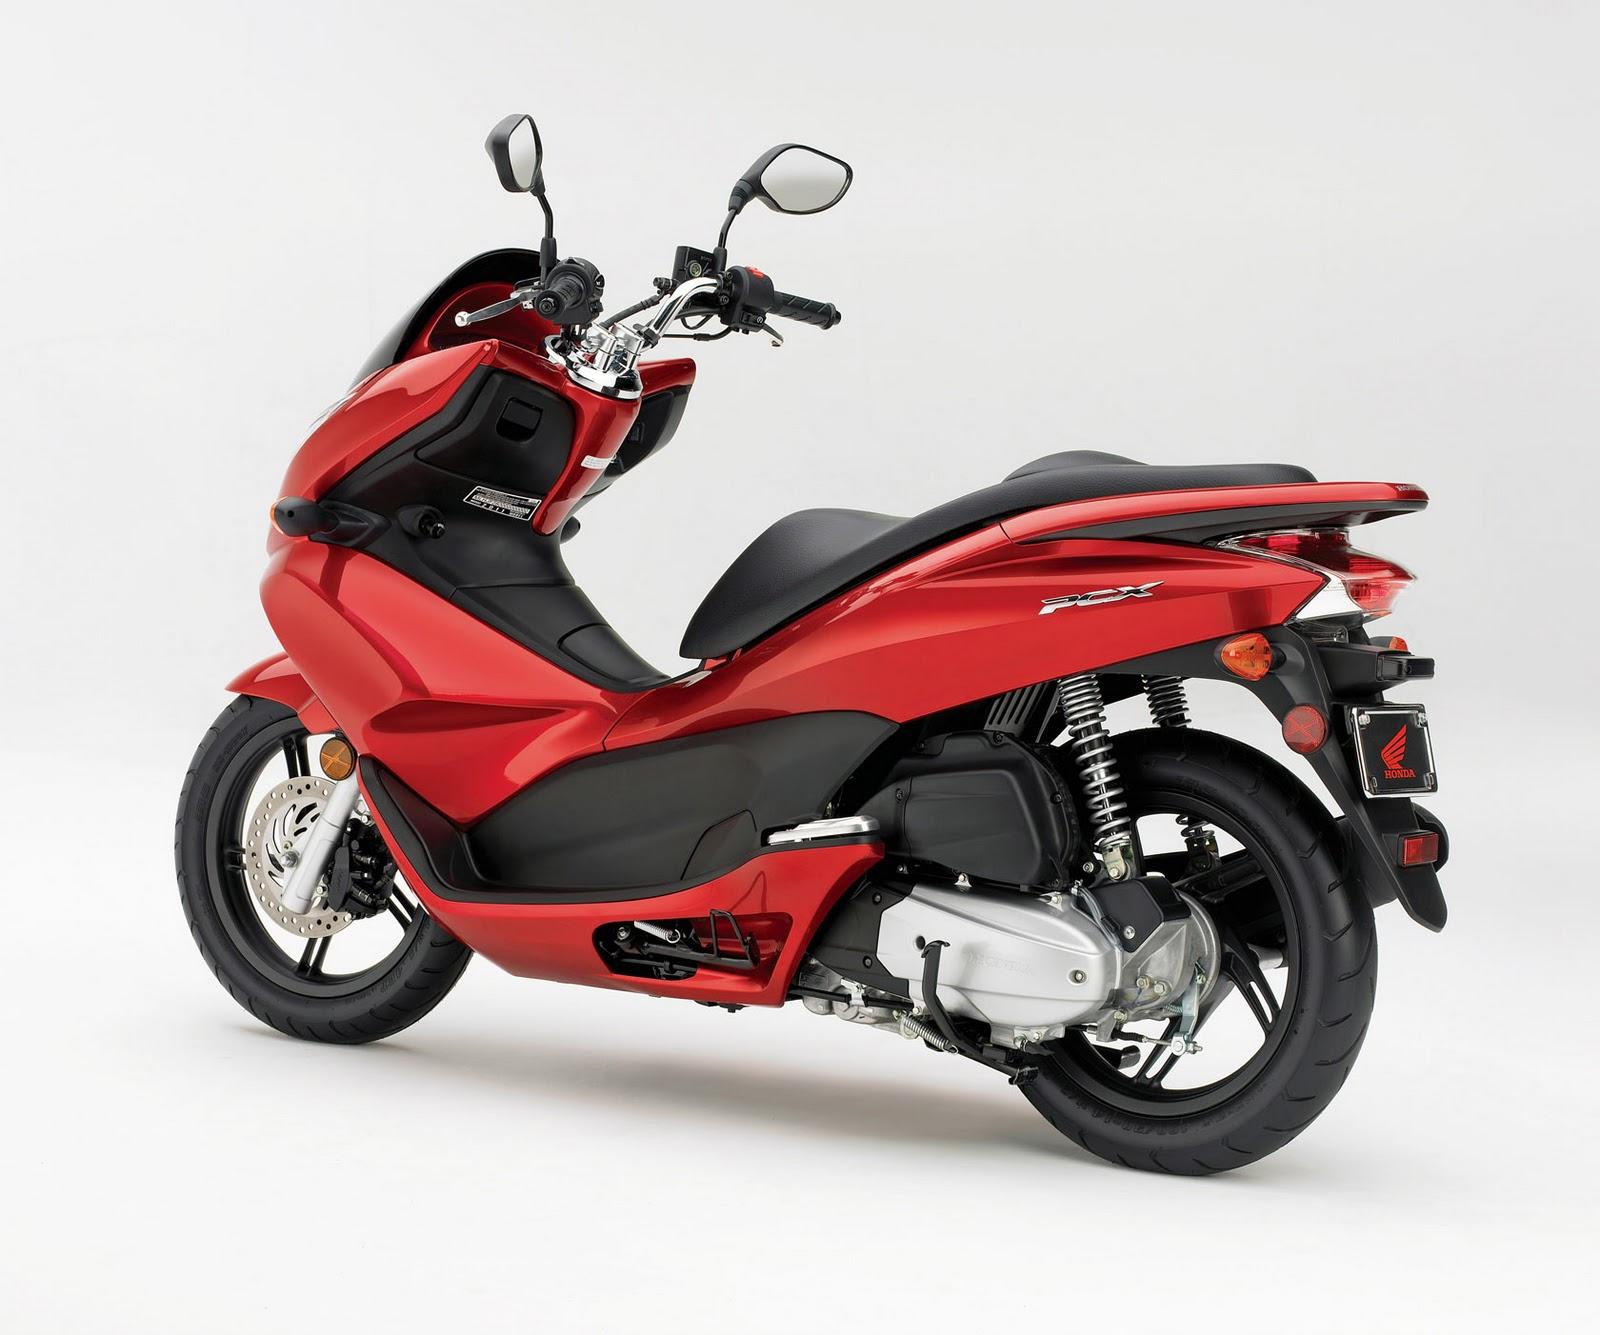 http://1.bp.blogspot.com/-mL9BKL0ShlI/TWbcpD038zI/AAAAAAAAAHk/5wQPvaw12MU/s1600/2011-Honda-PCX%20125-03.jpg